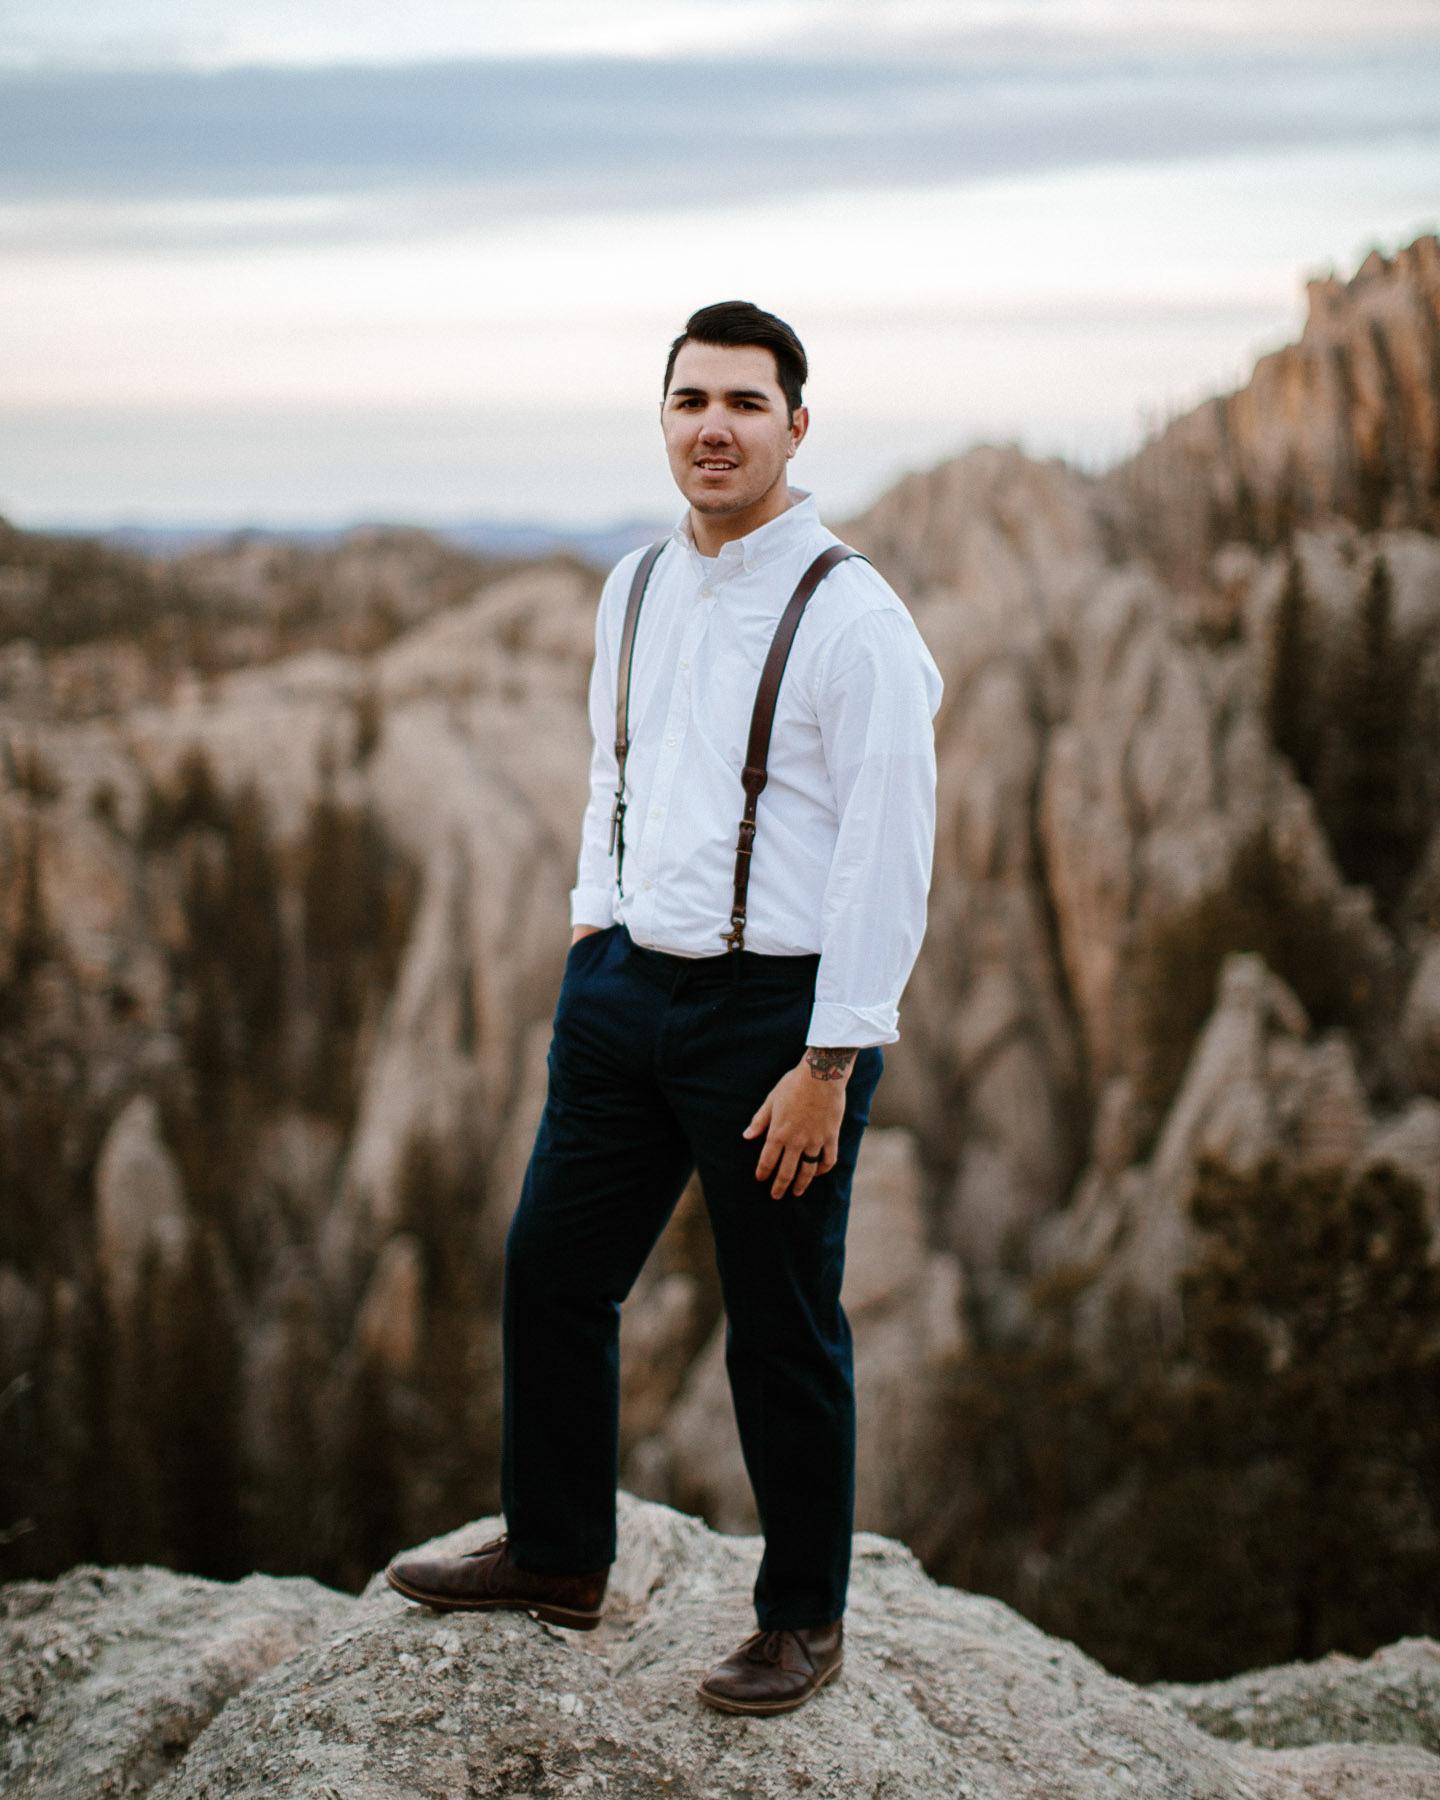 sioux-falls-black-hills-rapid-city-elopement-wedding-adventure-photographer-custer-sylvan-lake-53.jpg